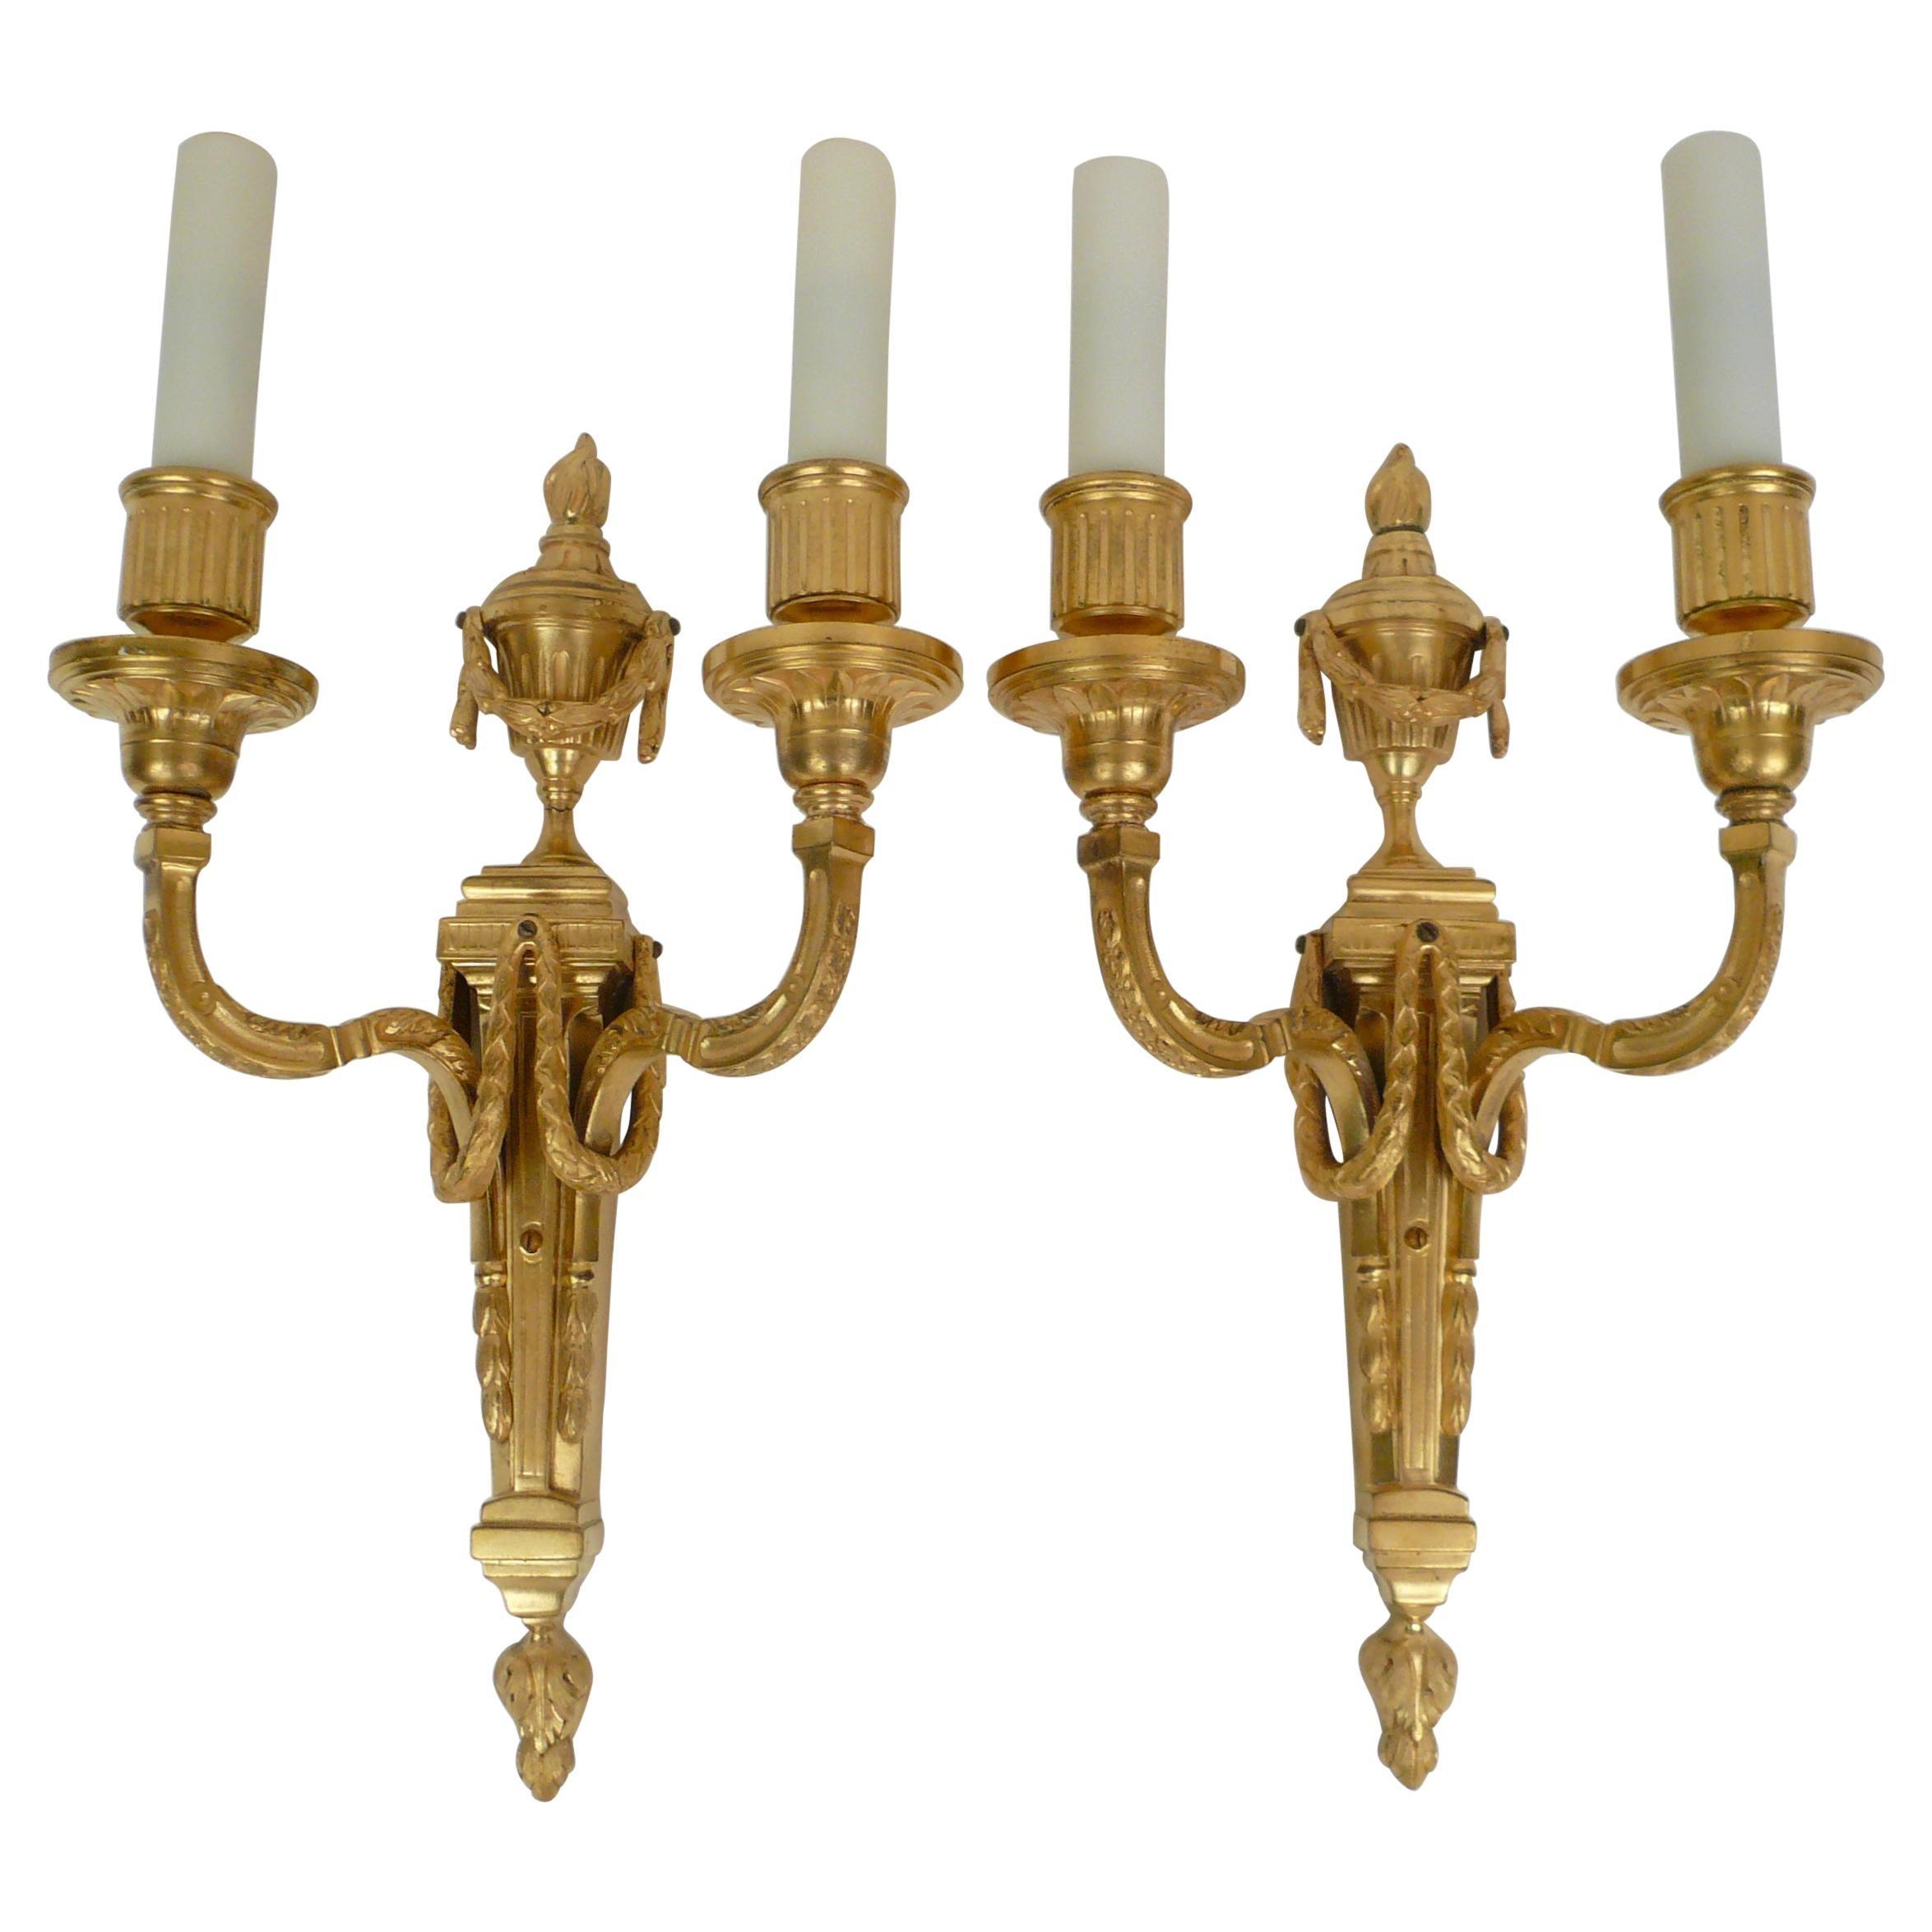 Pair Louis XVI Style Gilt Bronze Sconces by E. F. Caldwell